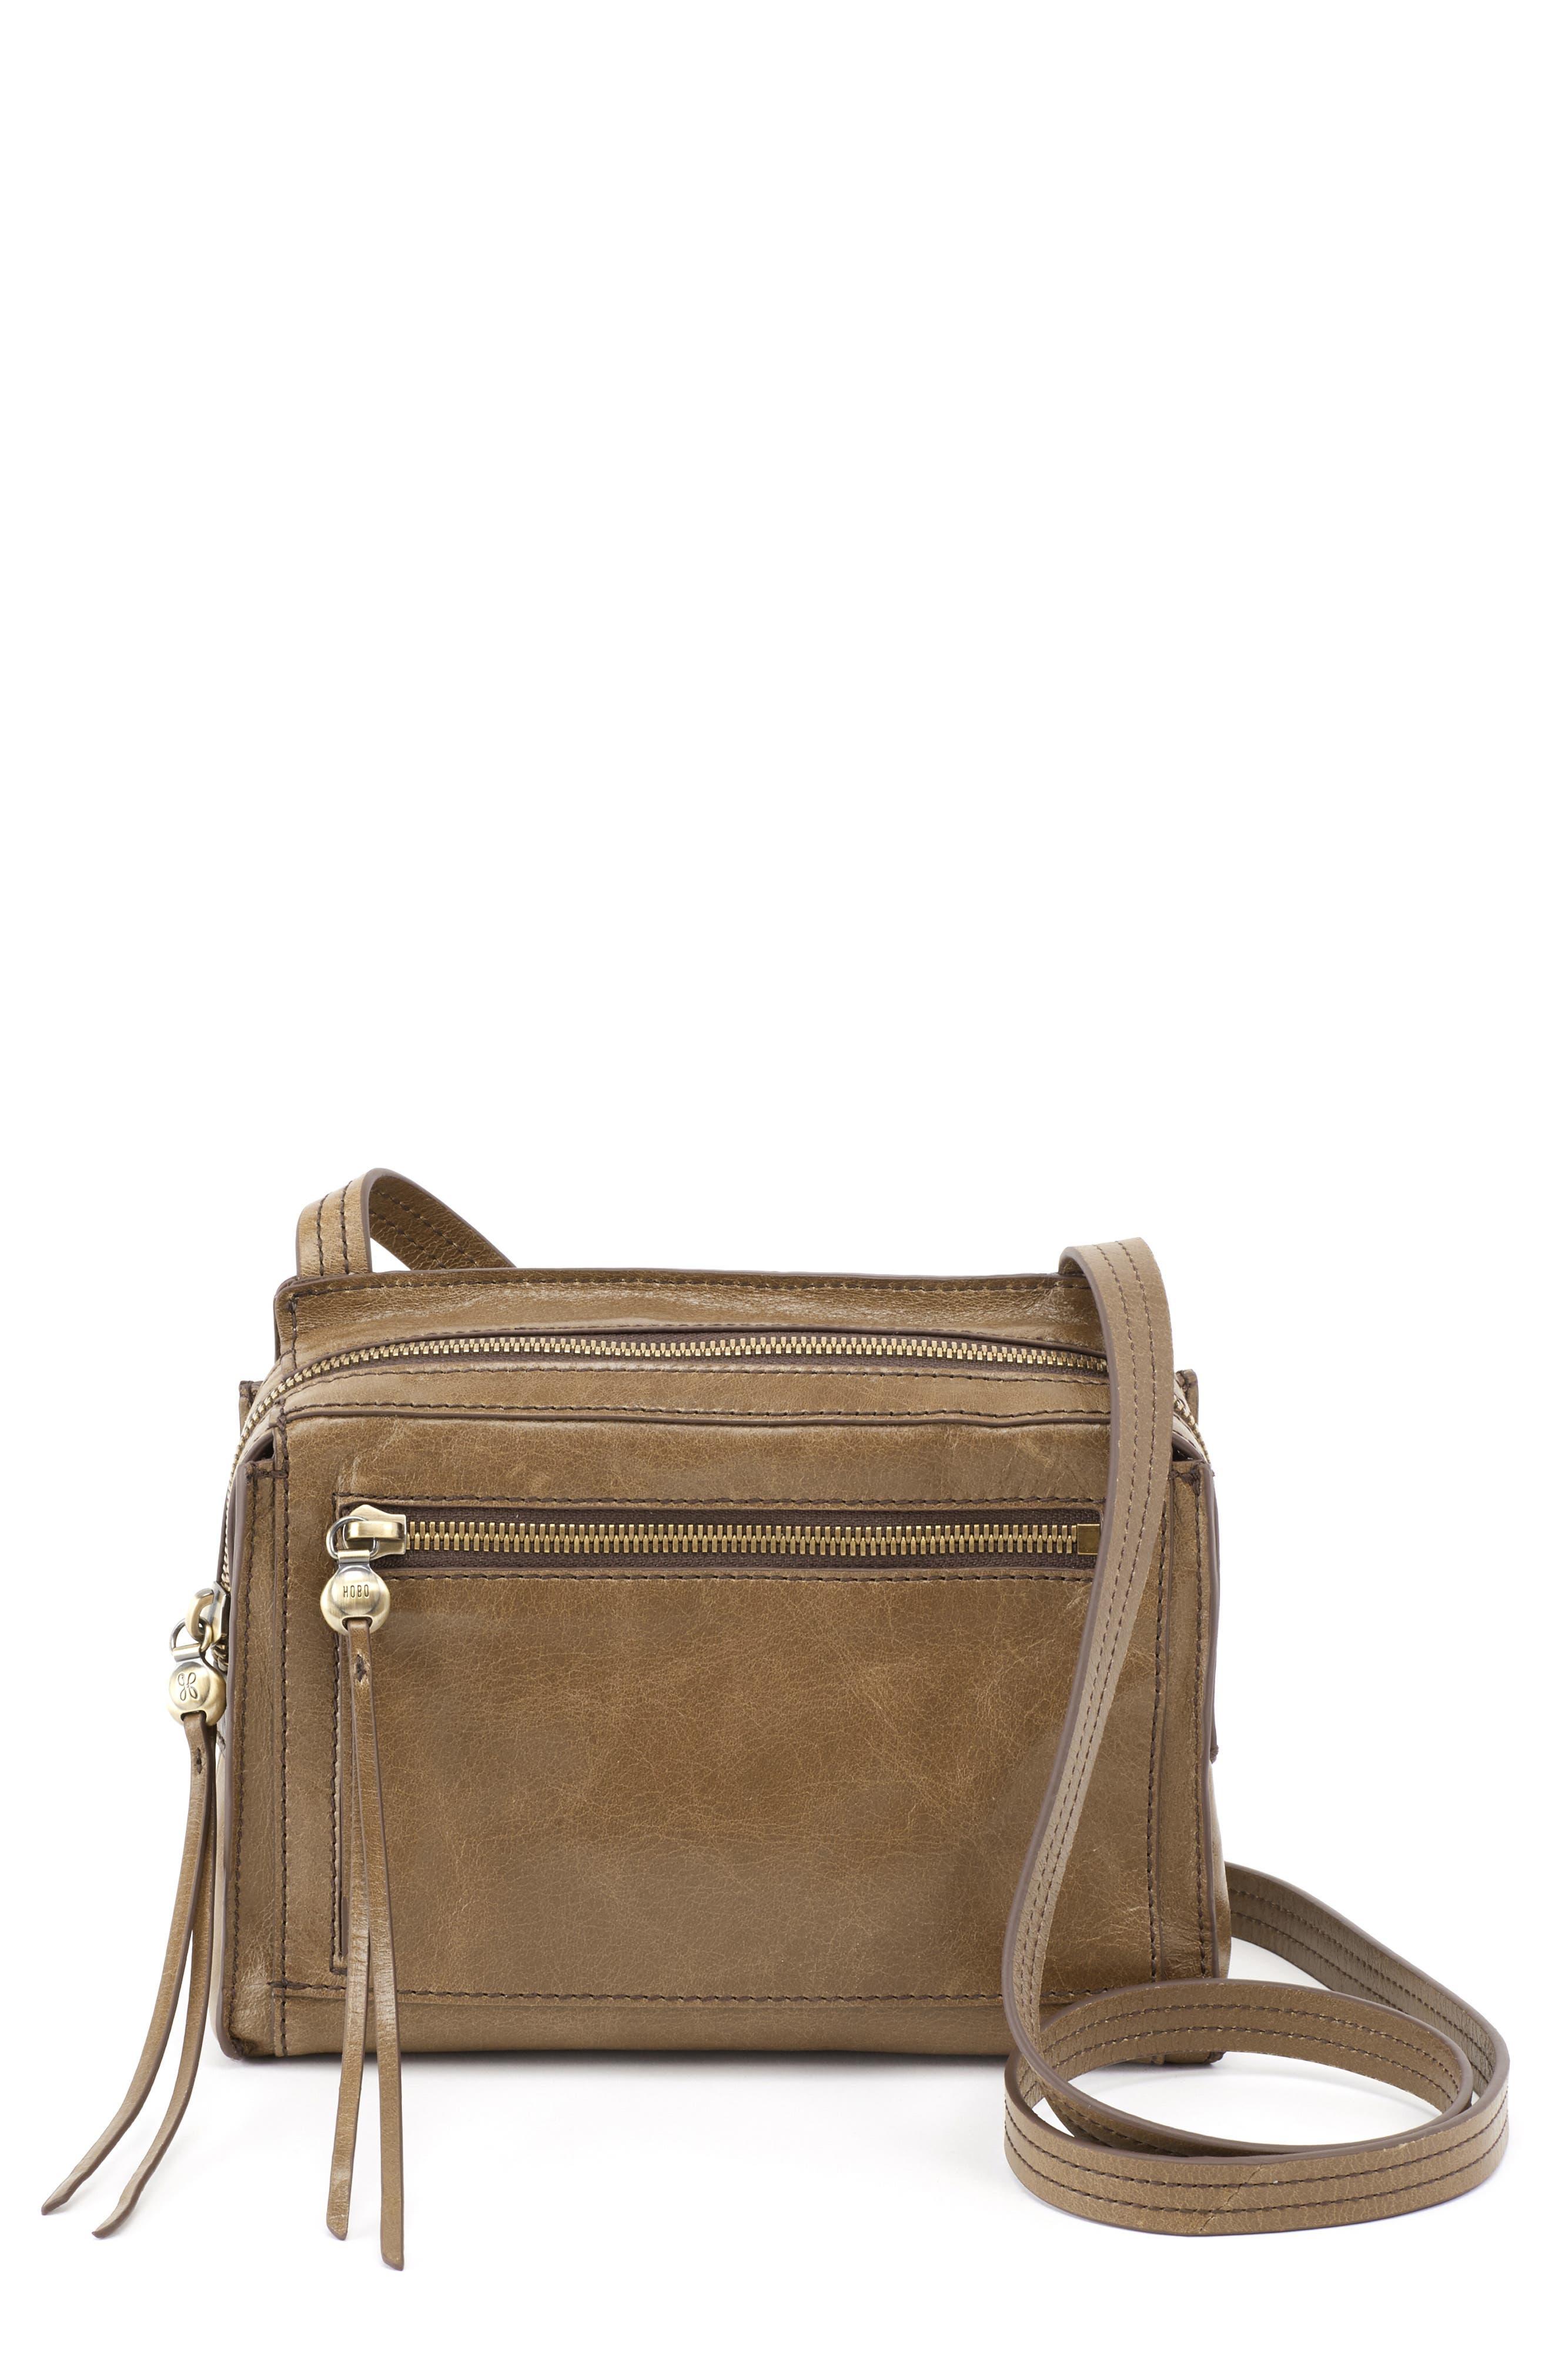 Hunter Crossbody Bag,                         Main,                         color, MINK